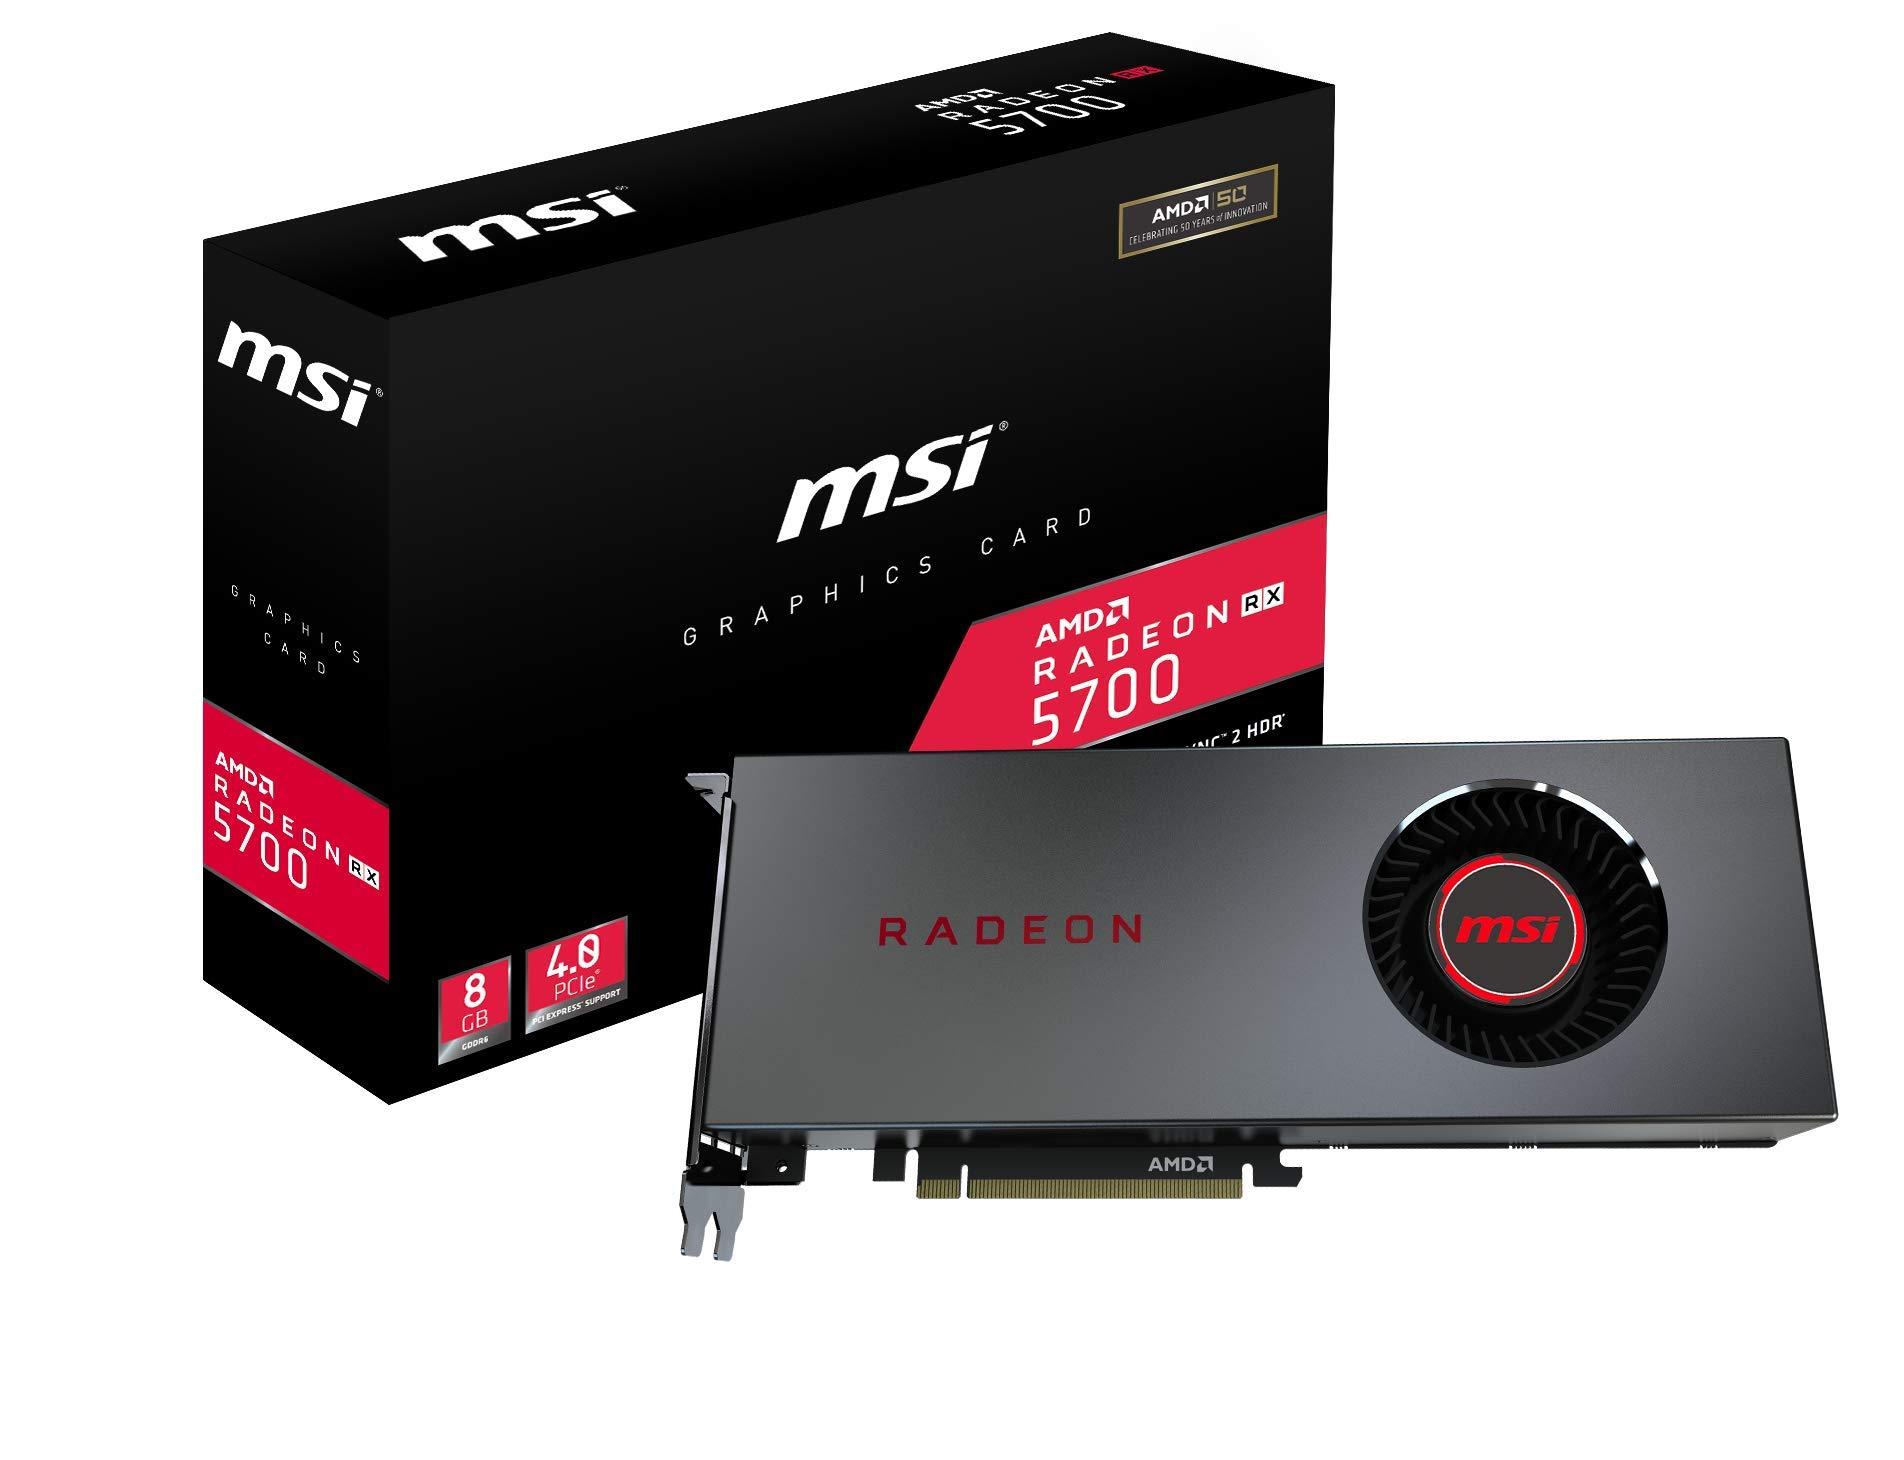 MSI Gaming Radeon RX 5700 256-bit HDMI/DP 8GB GDRR6 HDCP Support DirectX 12 Single Fan VR Ready OC Navi Architecture Graphics Card (Radeon RX 5700 8G) by MSI